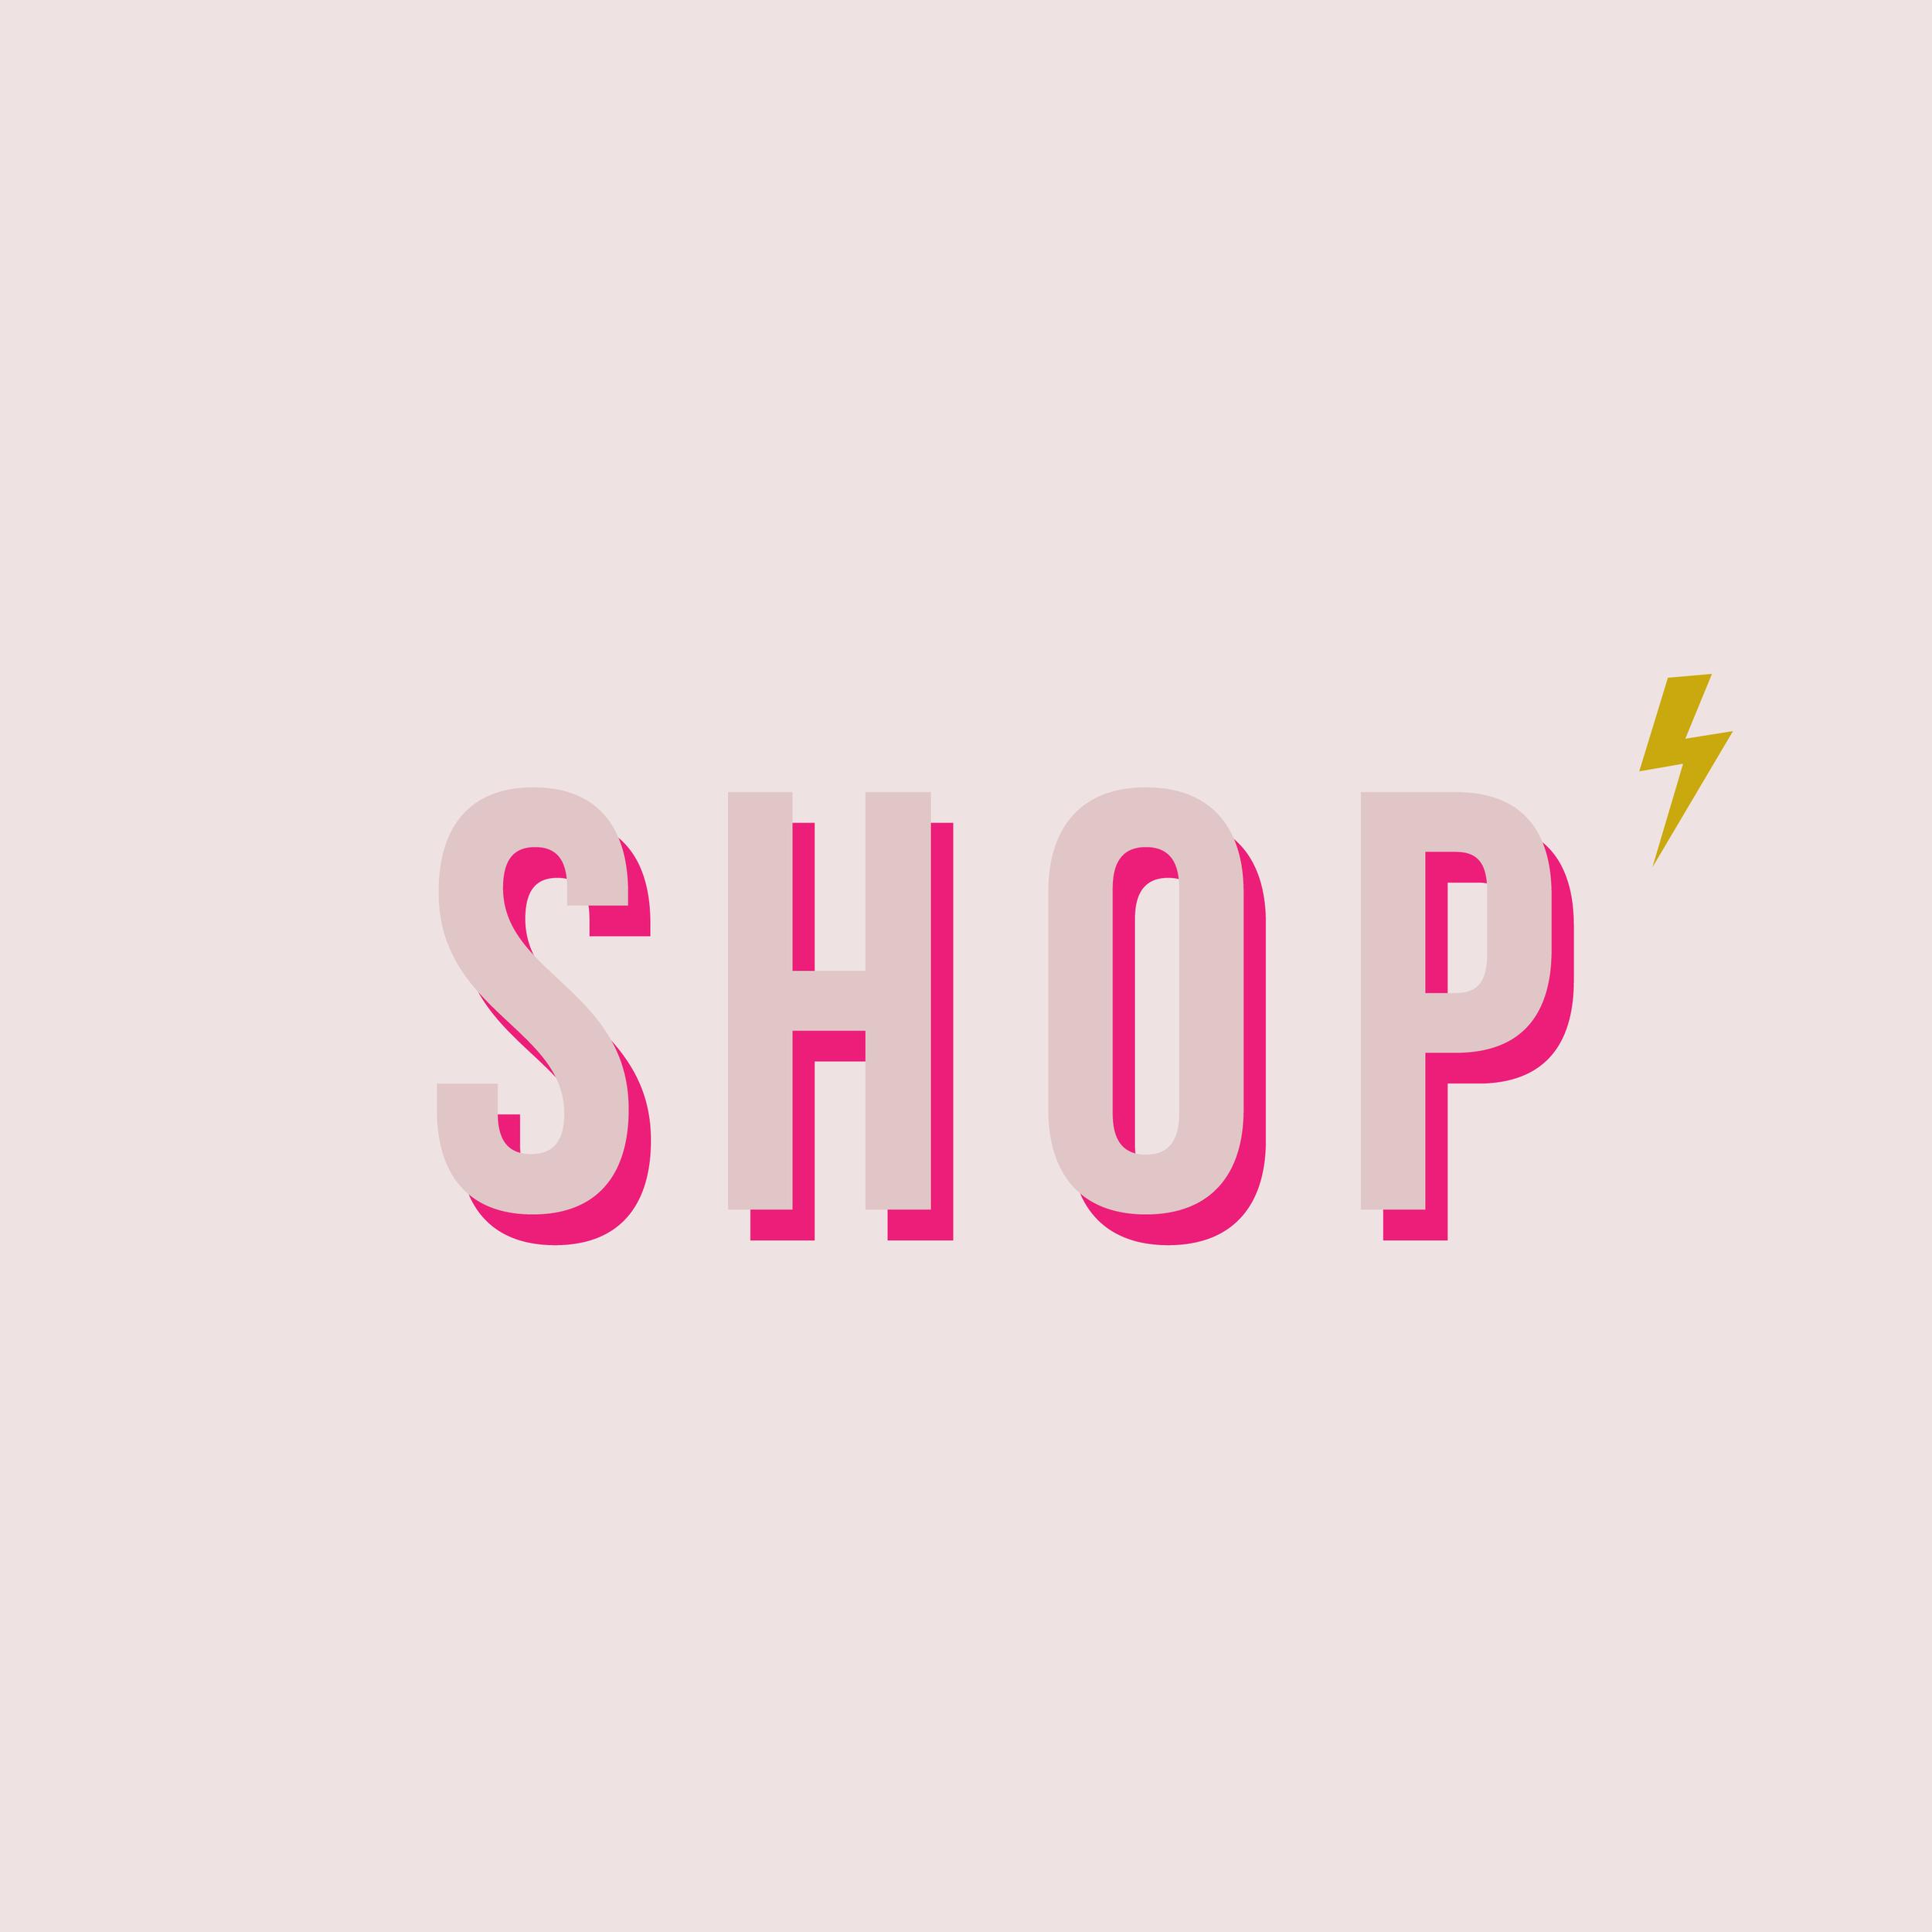 ShopWonderlust-01.png